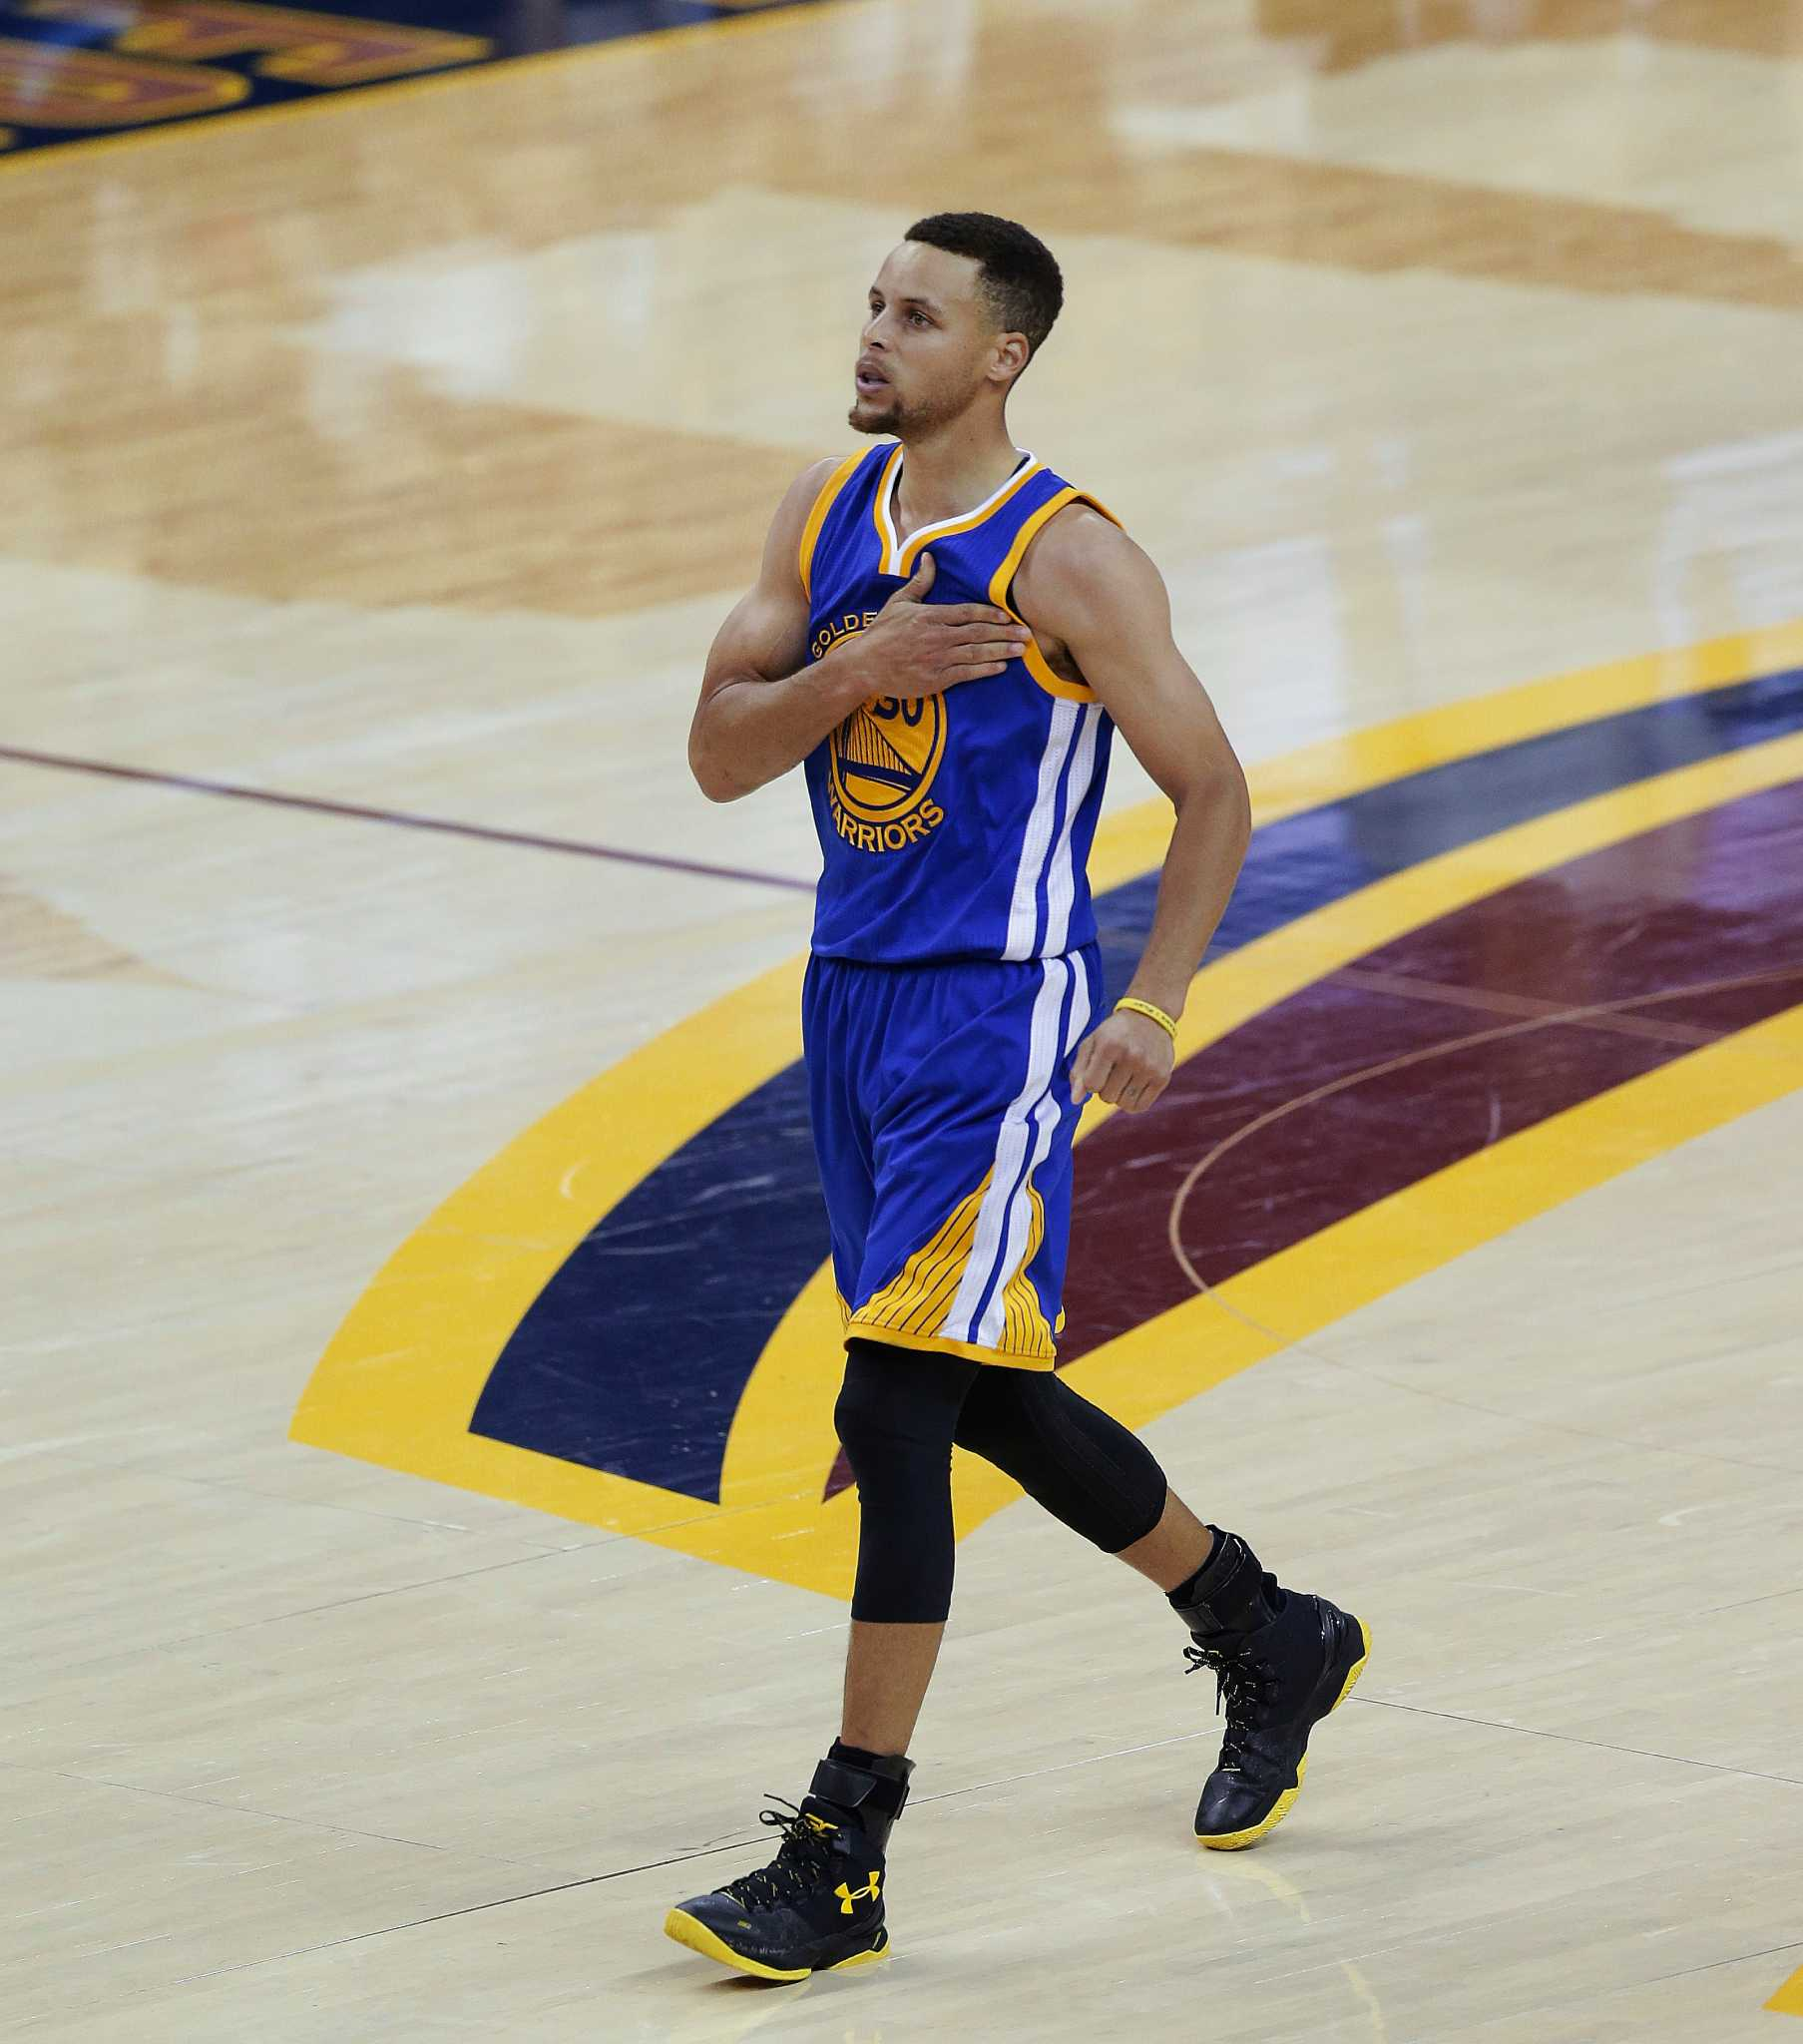 Splish splash Curry Thompson lead Warriors to Game 4